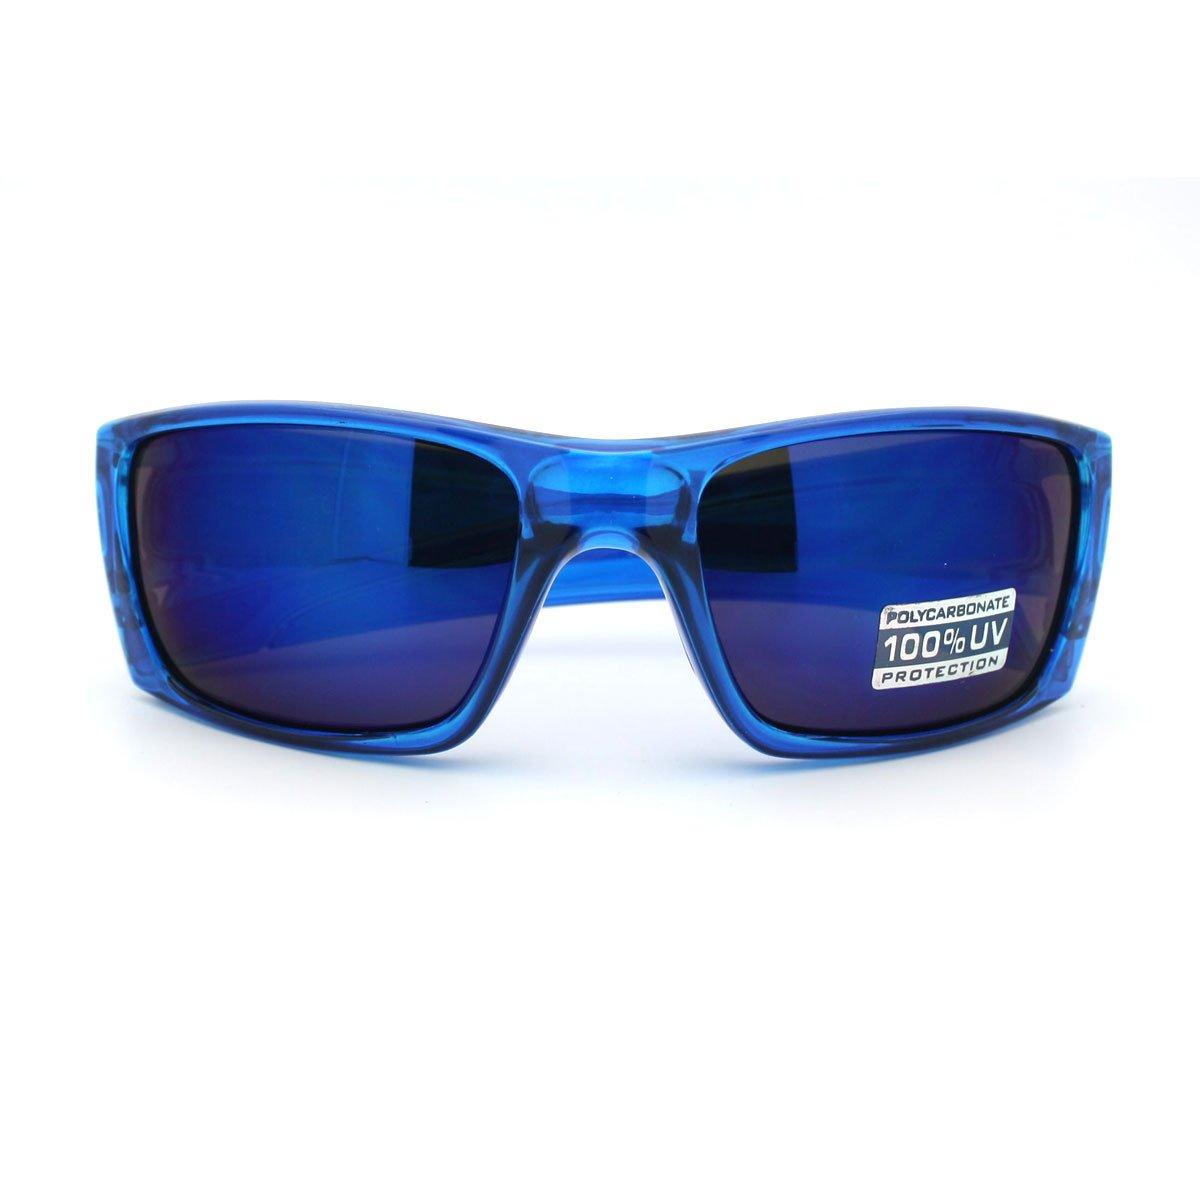 Designer Sunglasses Outdoor Sports Rectangular Wrap Fashion Multicolor Lens